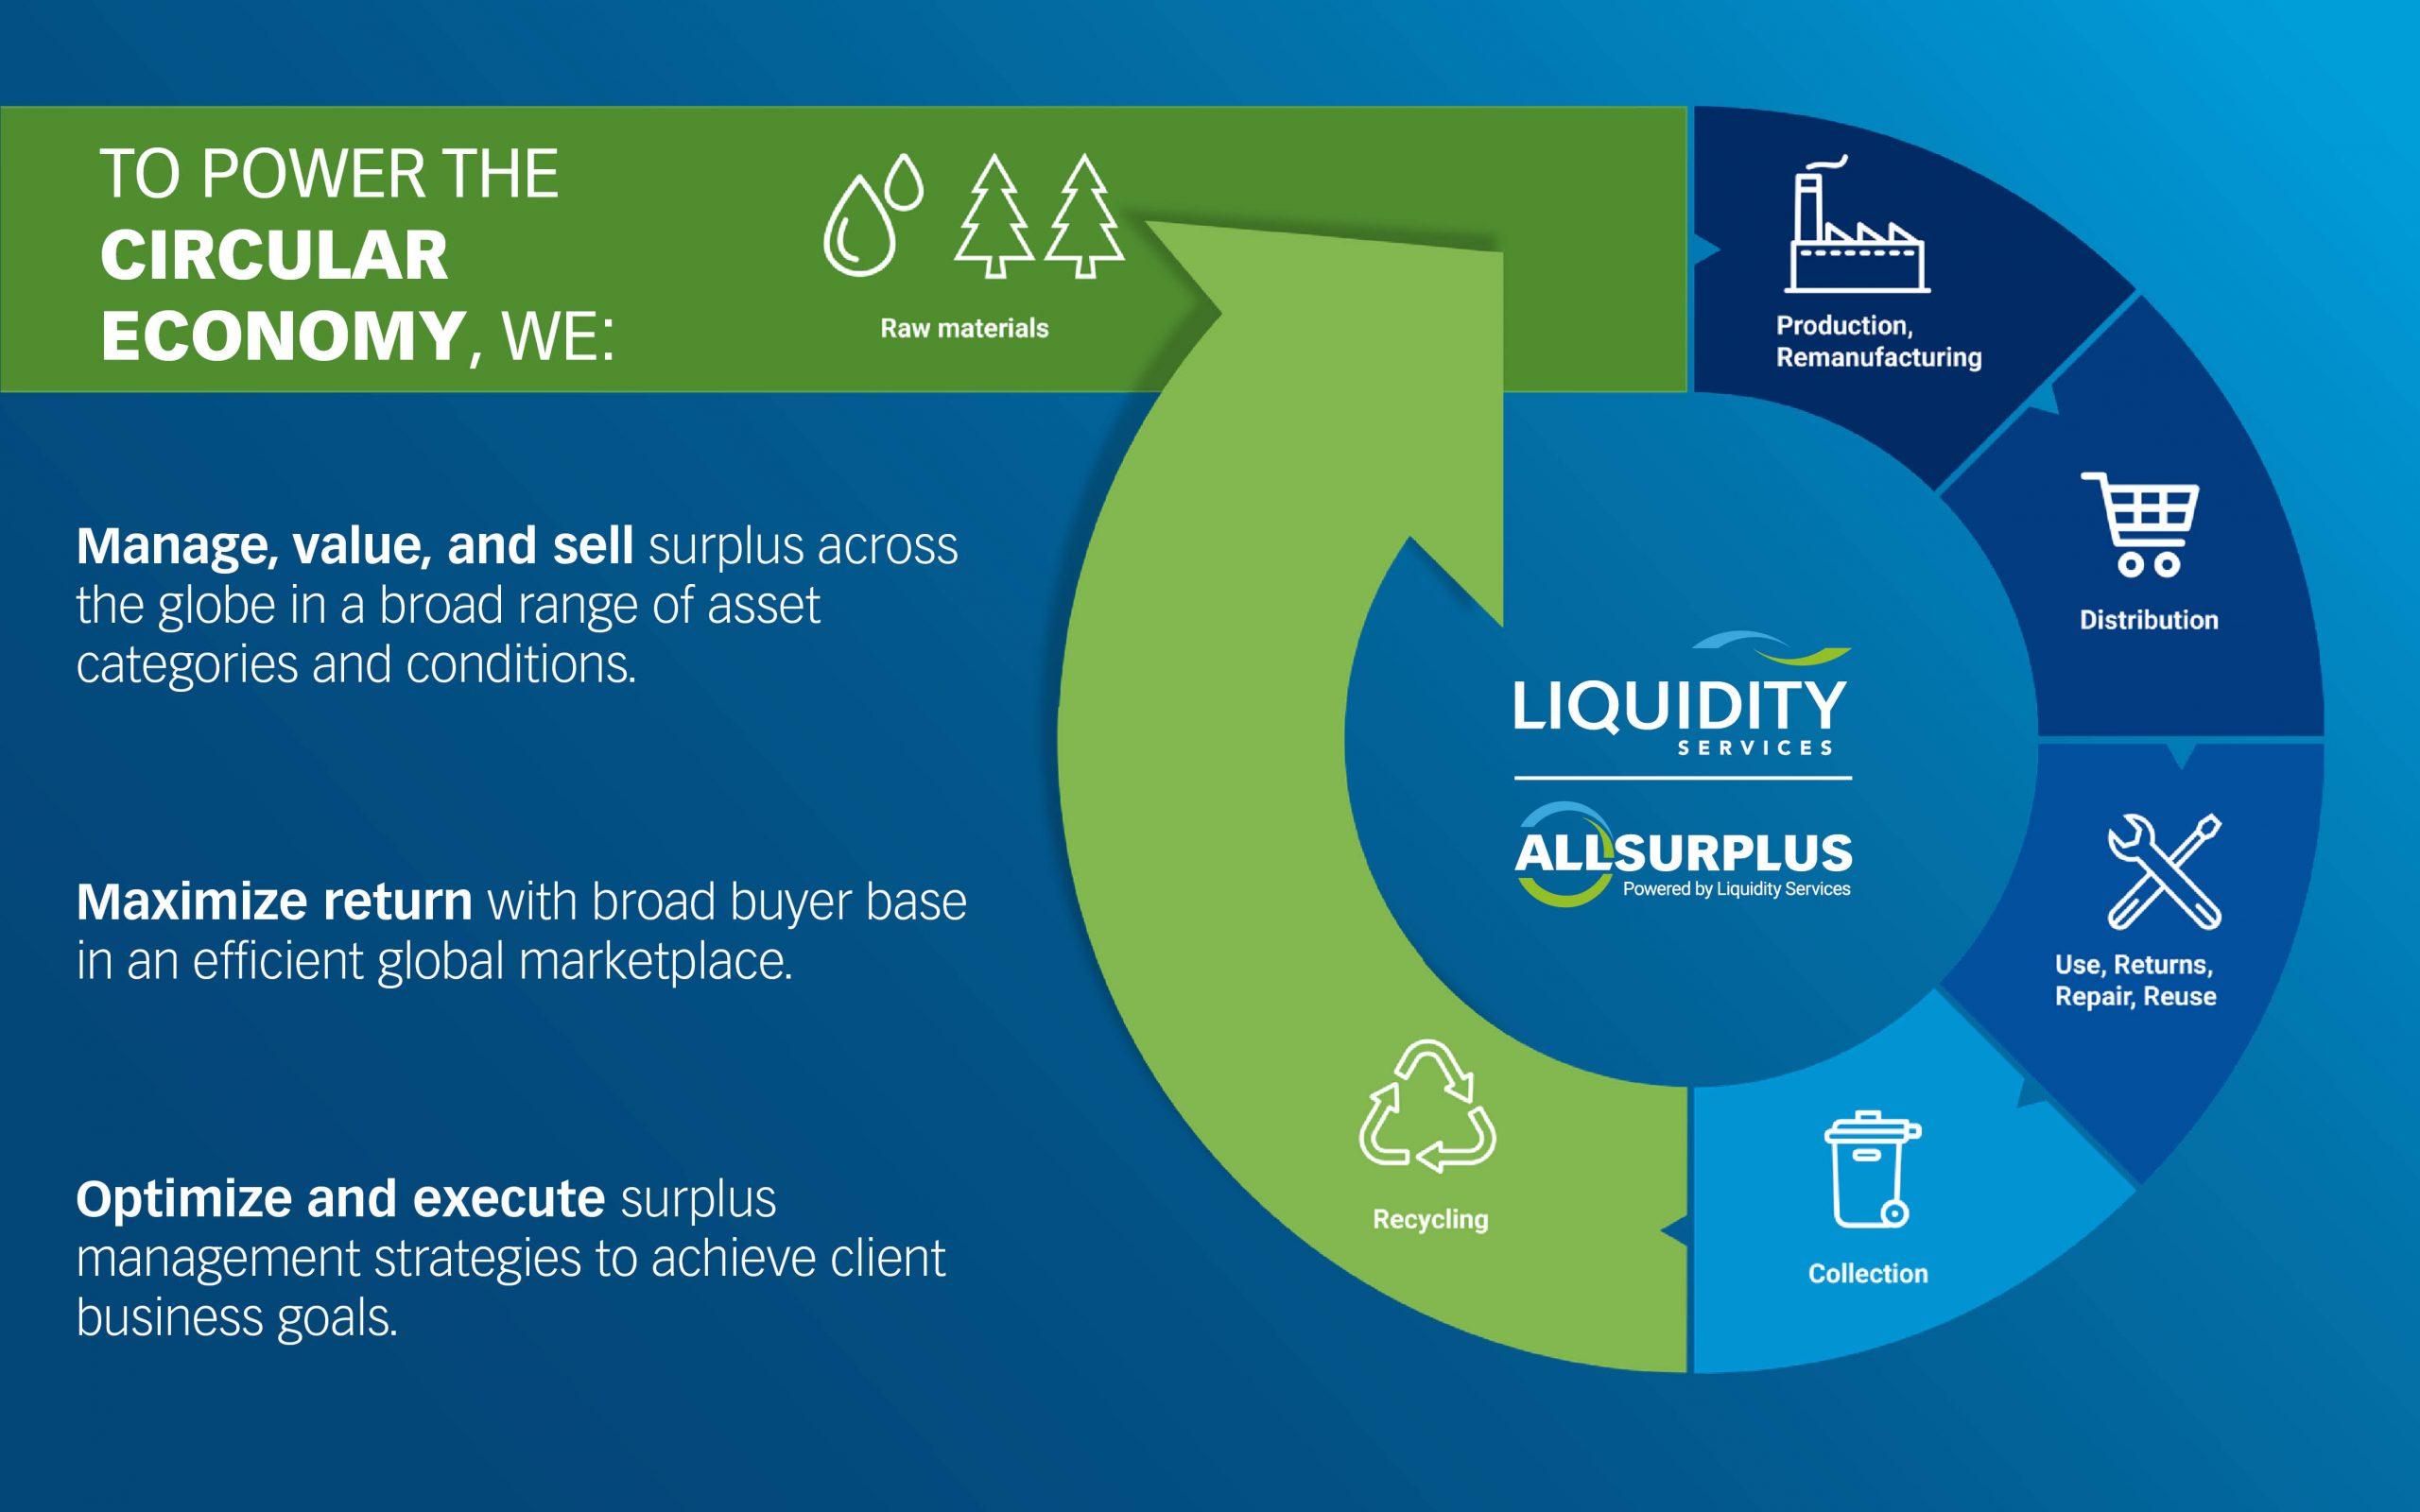 Circular Economy - Liquidity ser